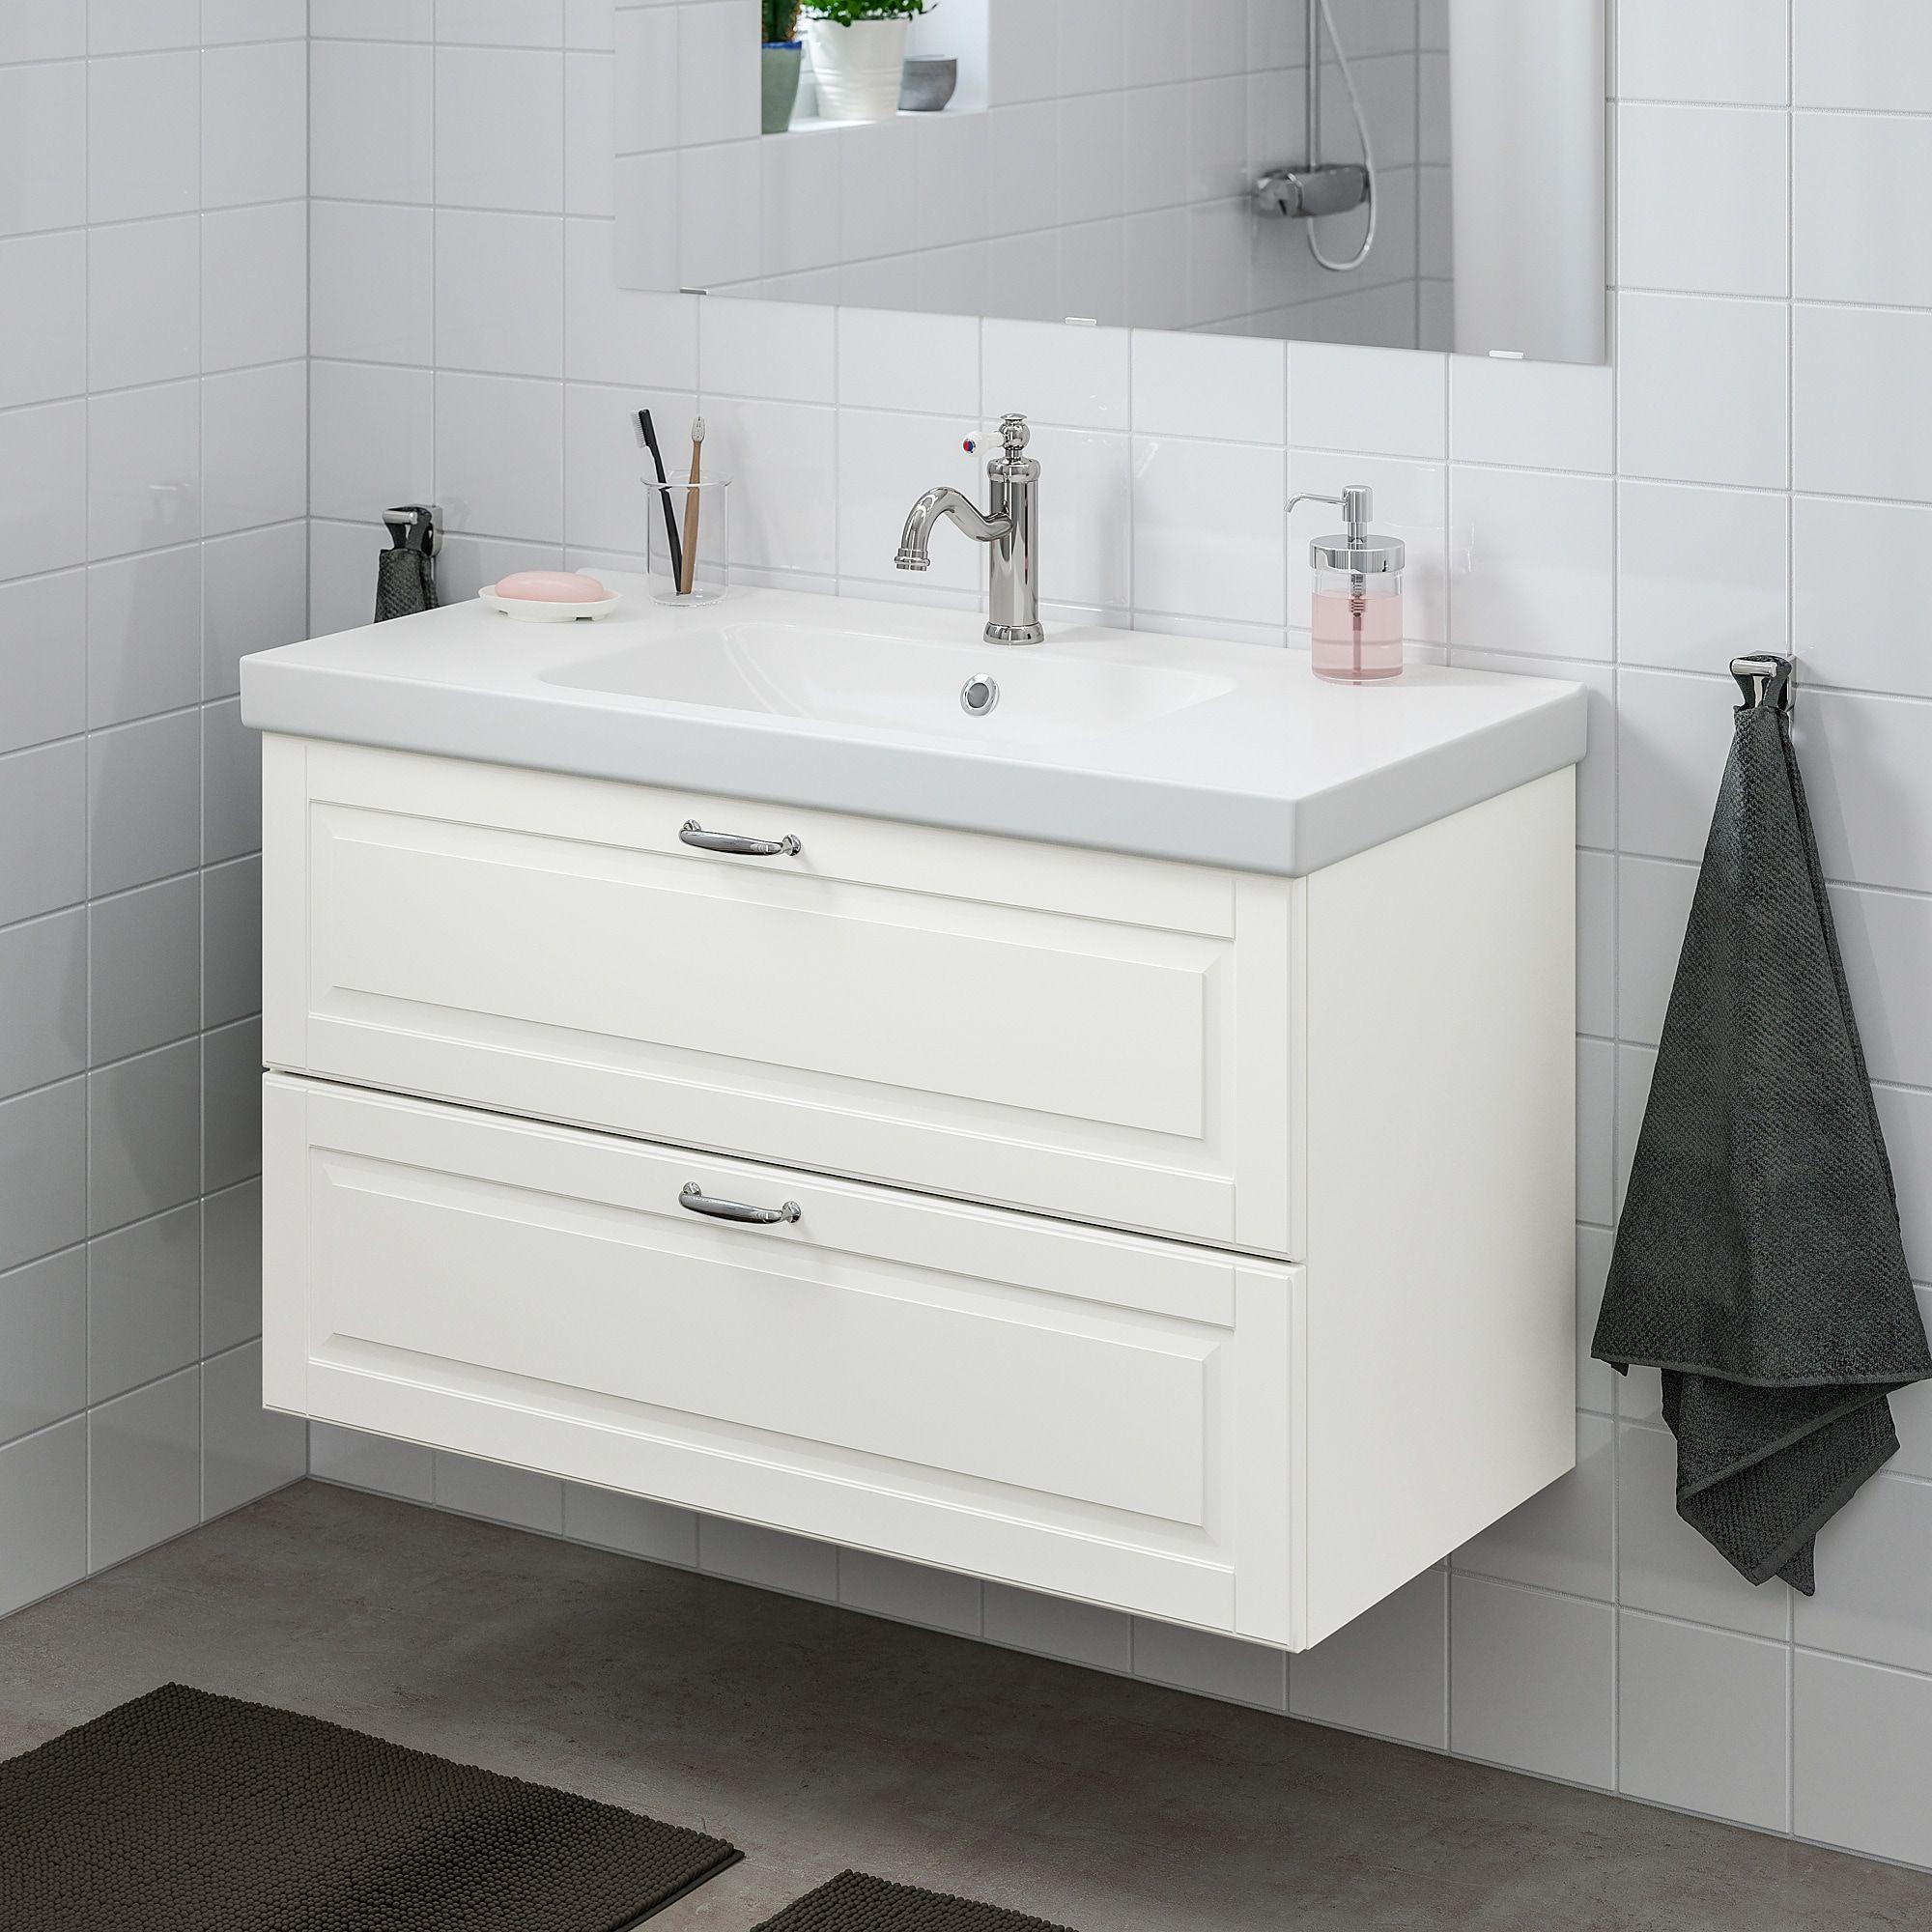 Home Furniture Décor Outdoors Shop Online In 2021 Ikea Godmorgon Sink Cabinet Bathroom Vanity